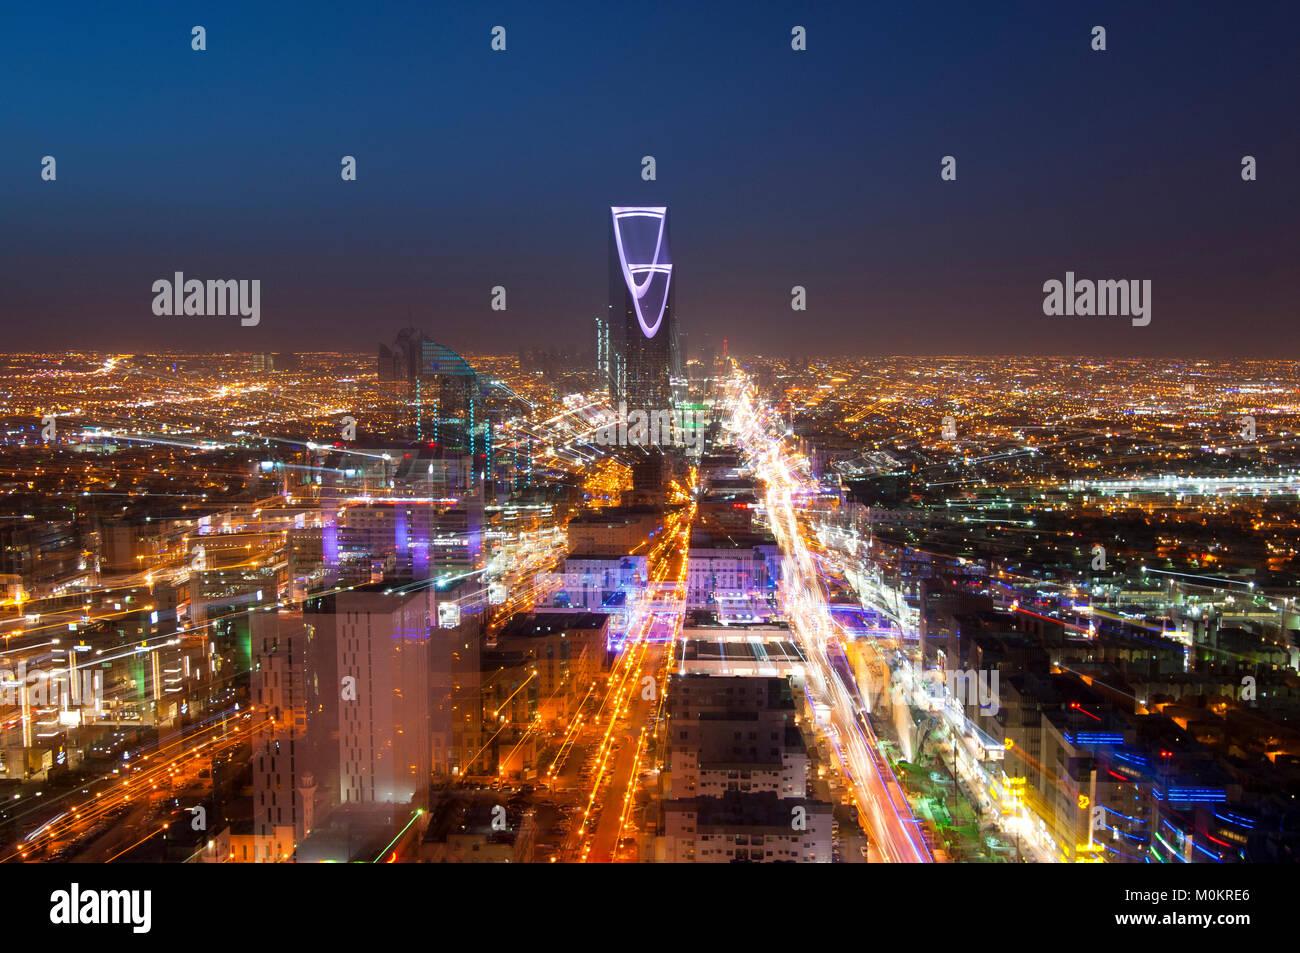 Ryad skyline en la noche #3 Imagen De Stock